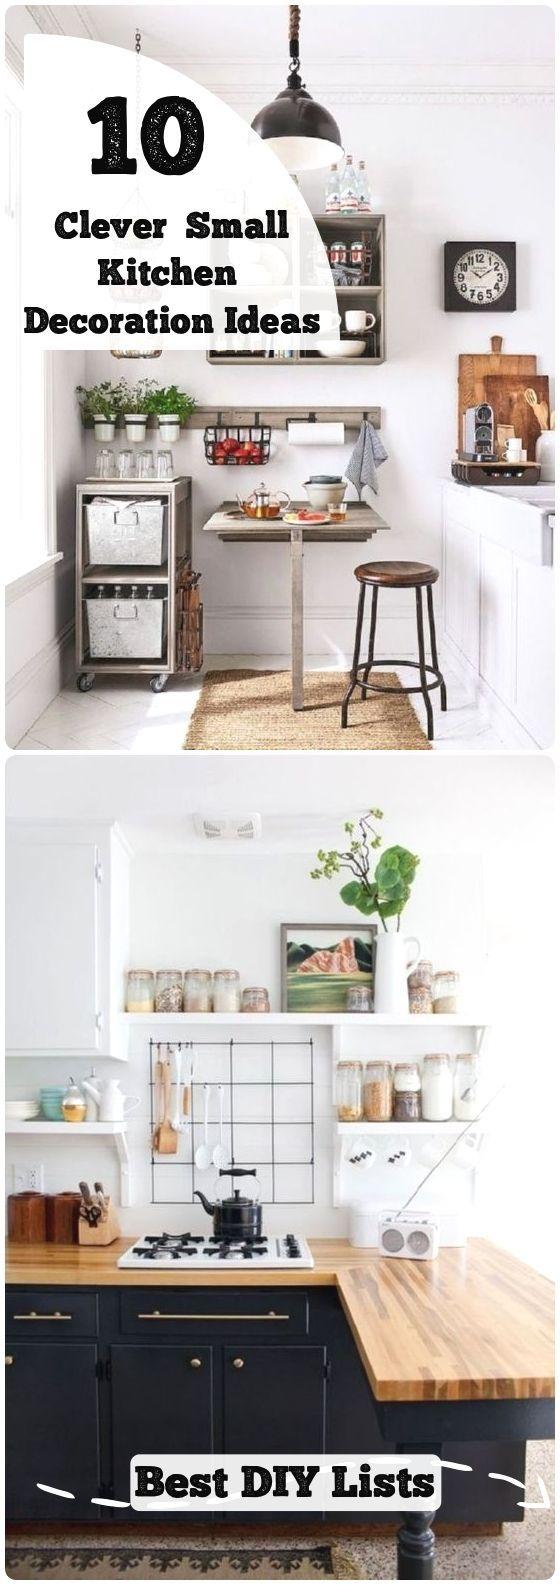 Open Kitchen RemodelNew Small Kitchen Decoration #kitchendecoration #kitchen #kitchendecor #kitchenremodel #homedecor #openkitchen